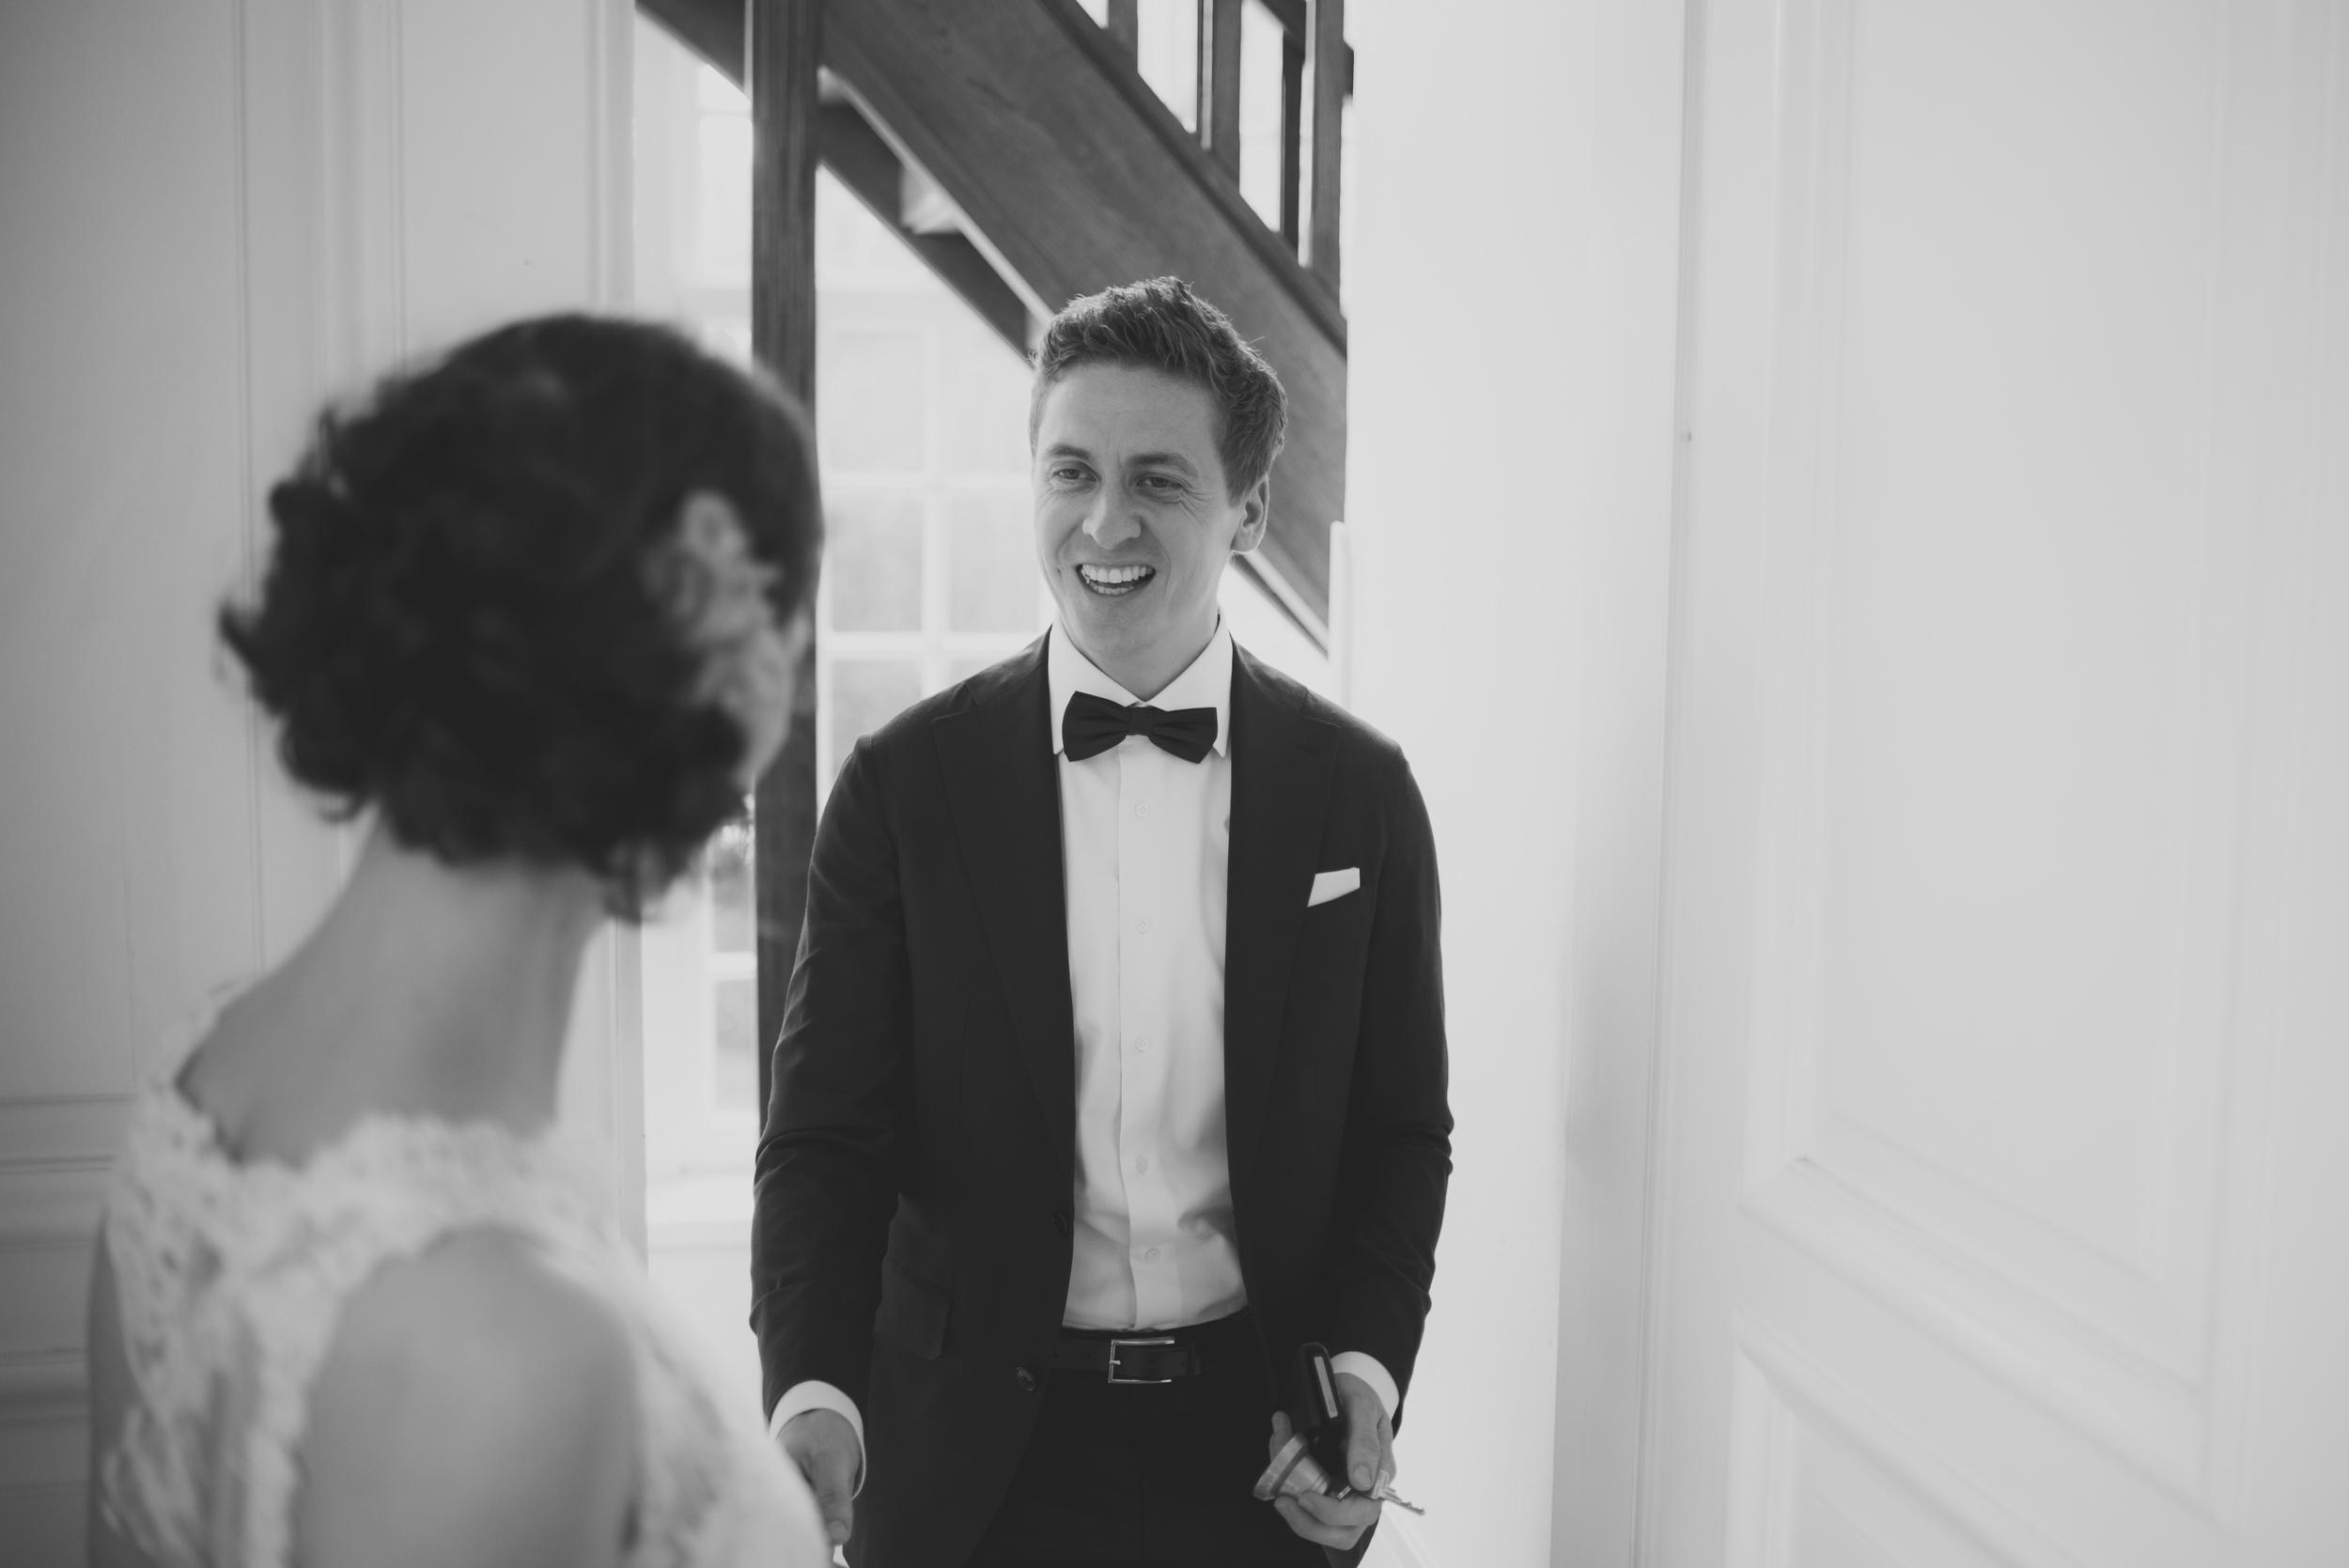 Hochzeitsfotograf-Schlossruine-Hertefeld-Weeze-009.jpg